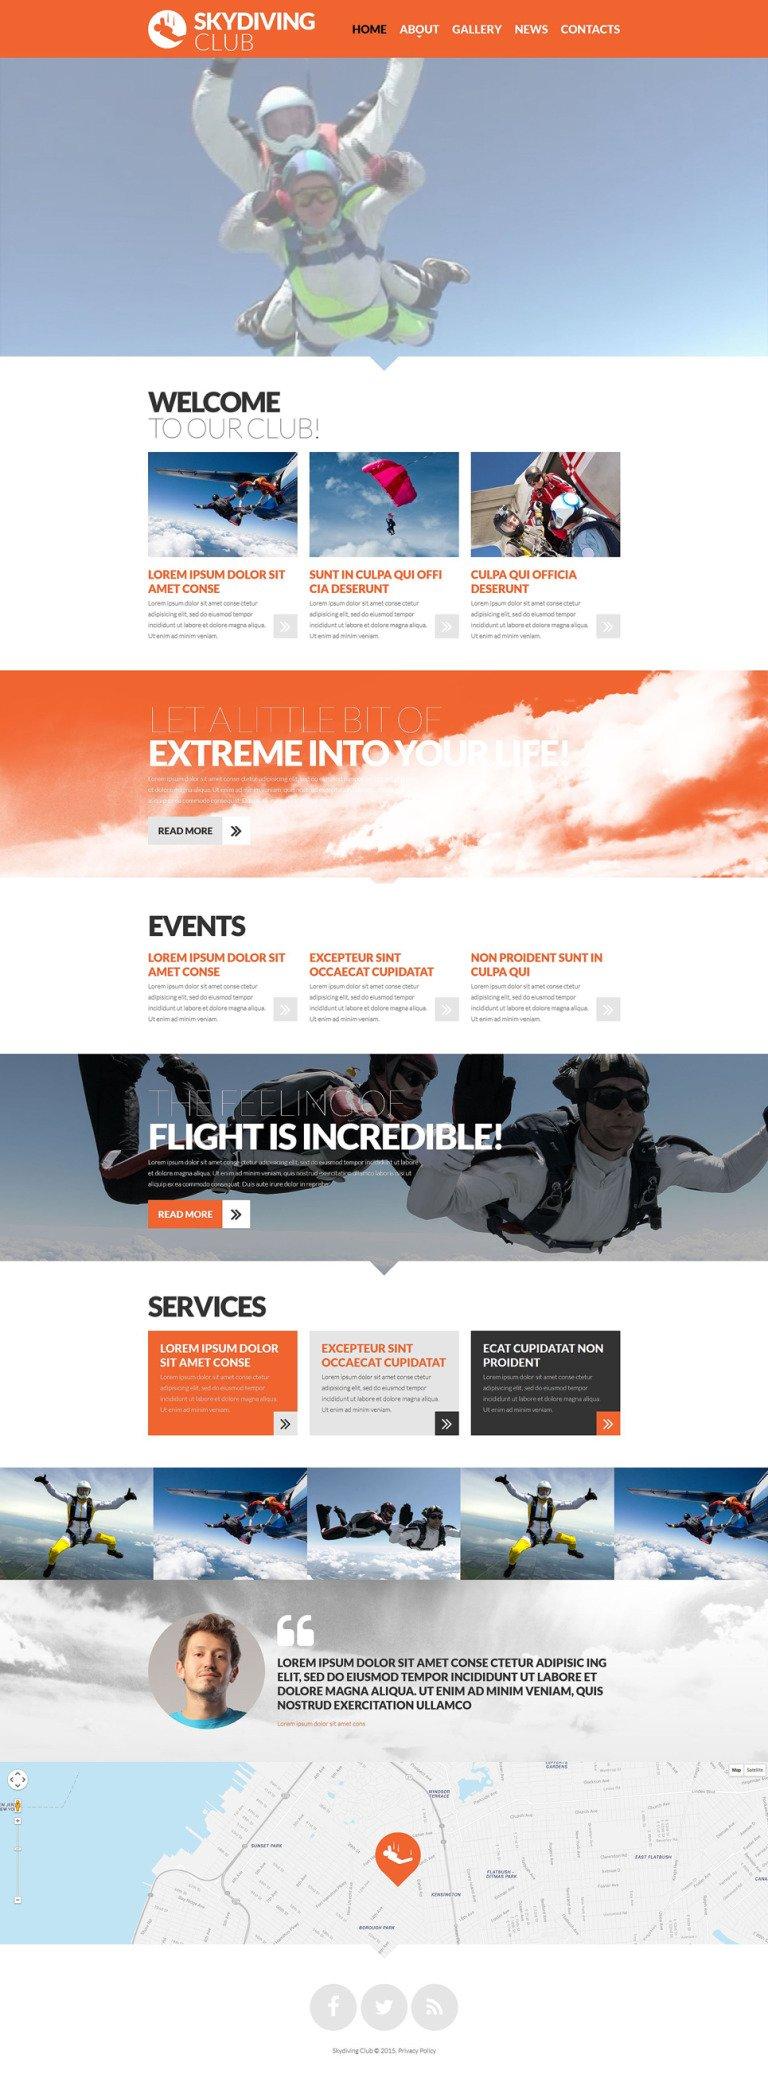 Skydiving Club Website Template New Screenshots BIG